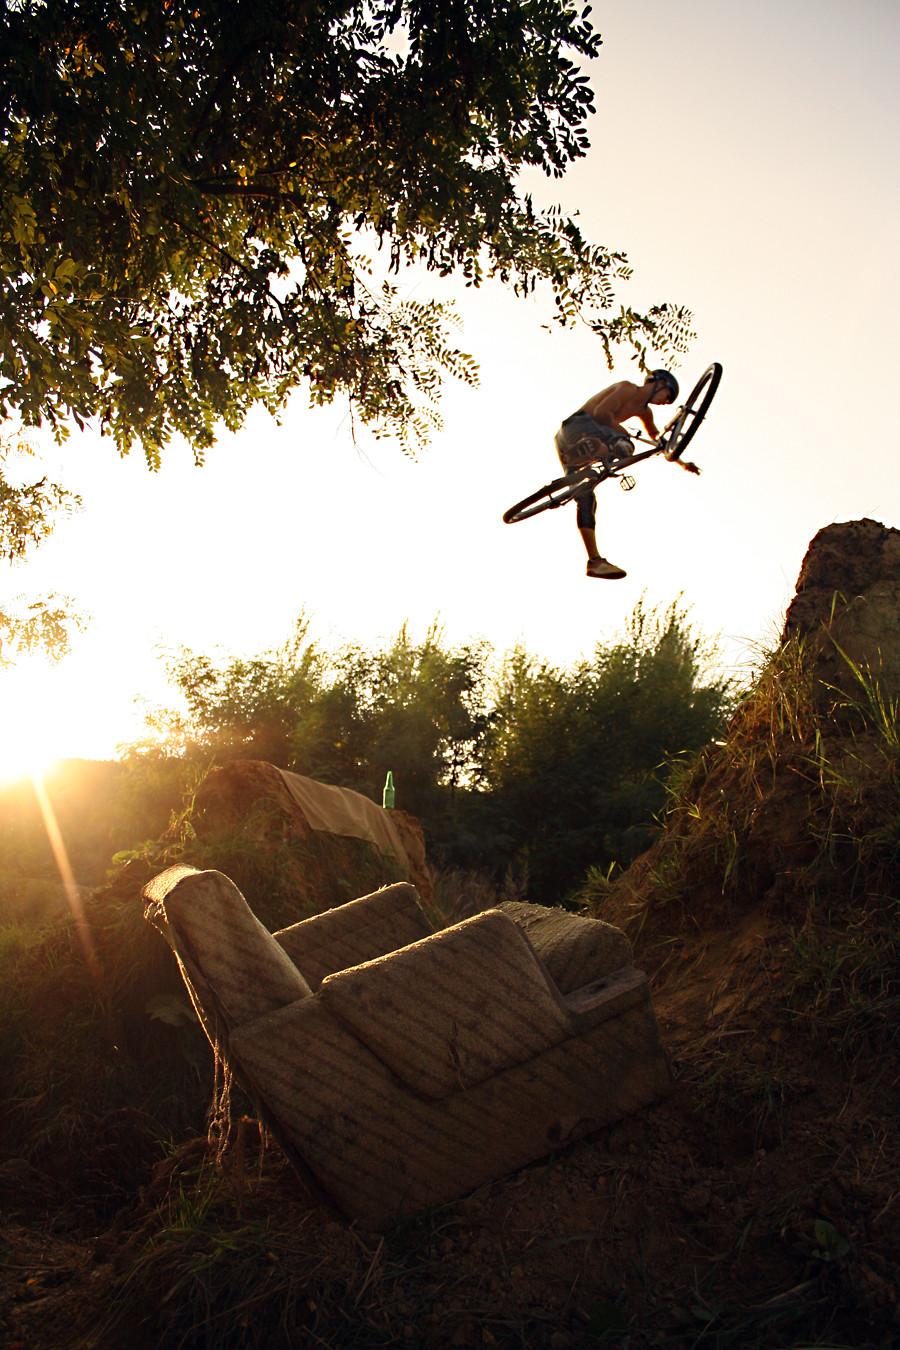 sunset - B Gabo - Mountain Biking Pictures - Vital MTB